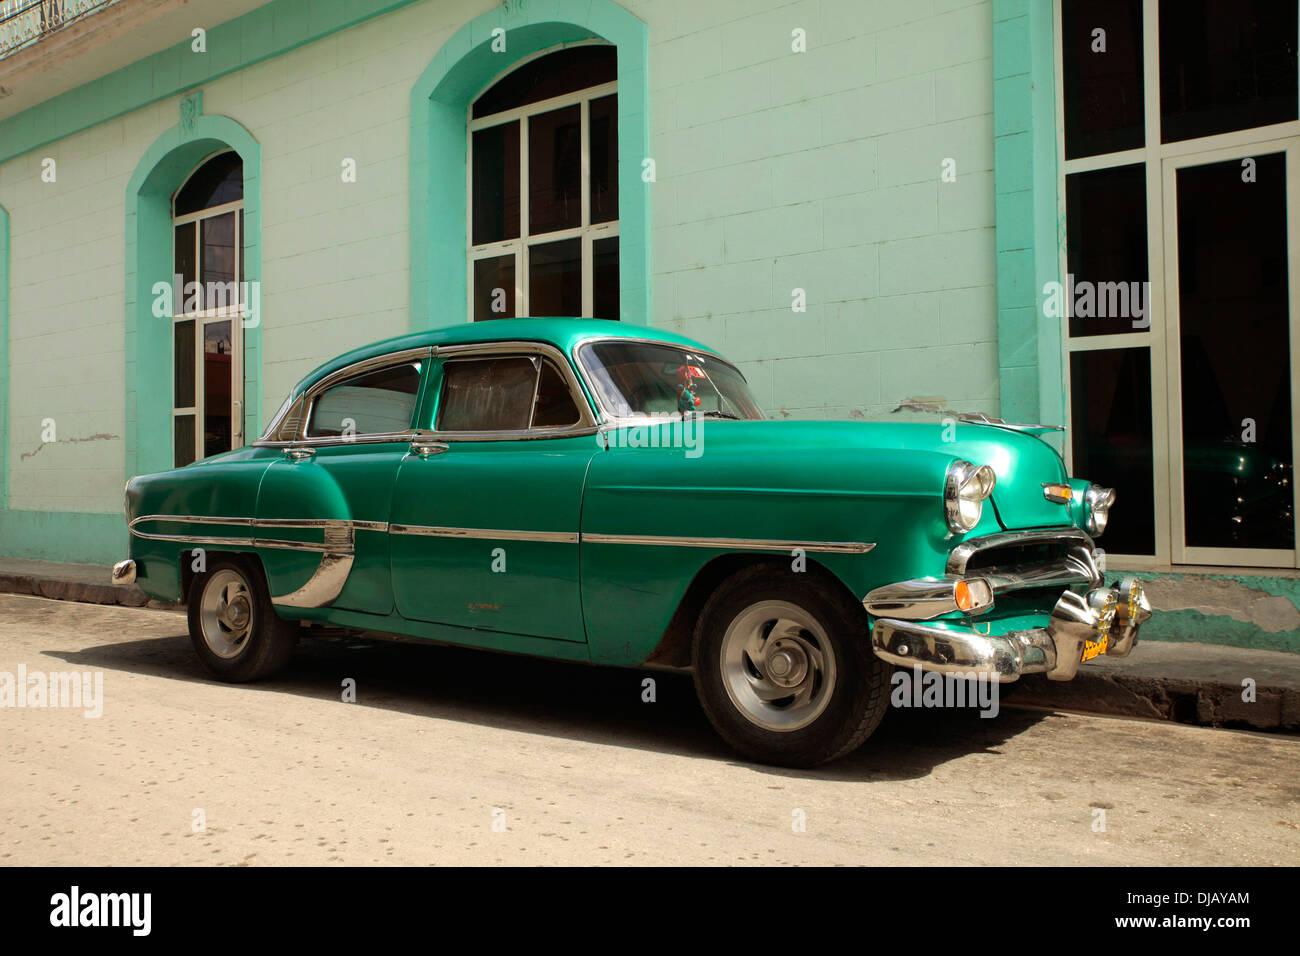 Vintage car, American classic car, Camagüey, Cuba - Stock Image